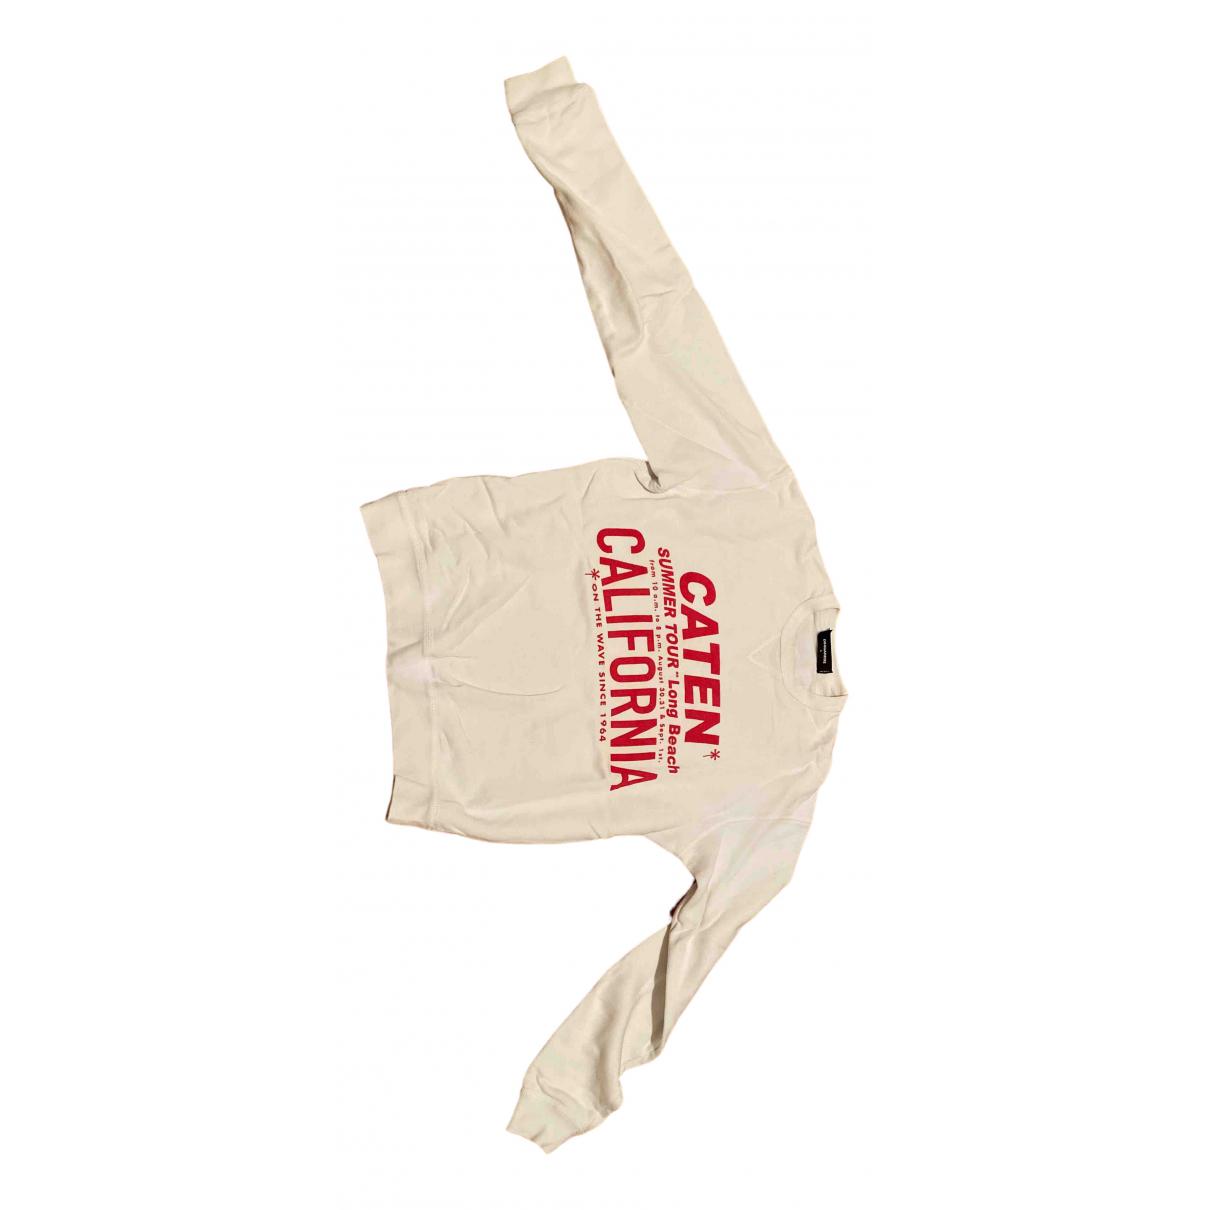 Dsquared2 N White Cotton Knitwear & Sweatshirts for Men L International